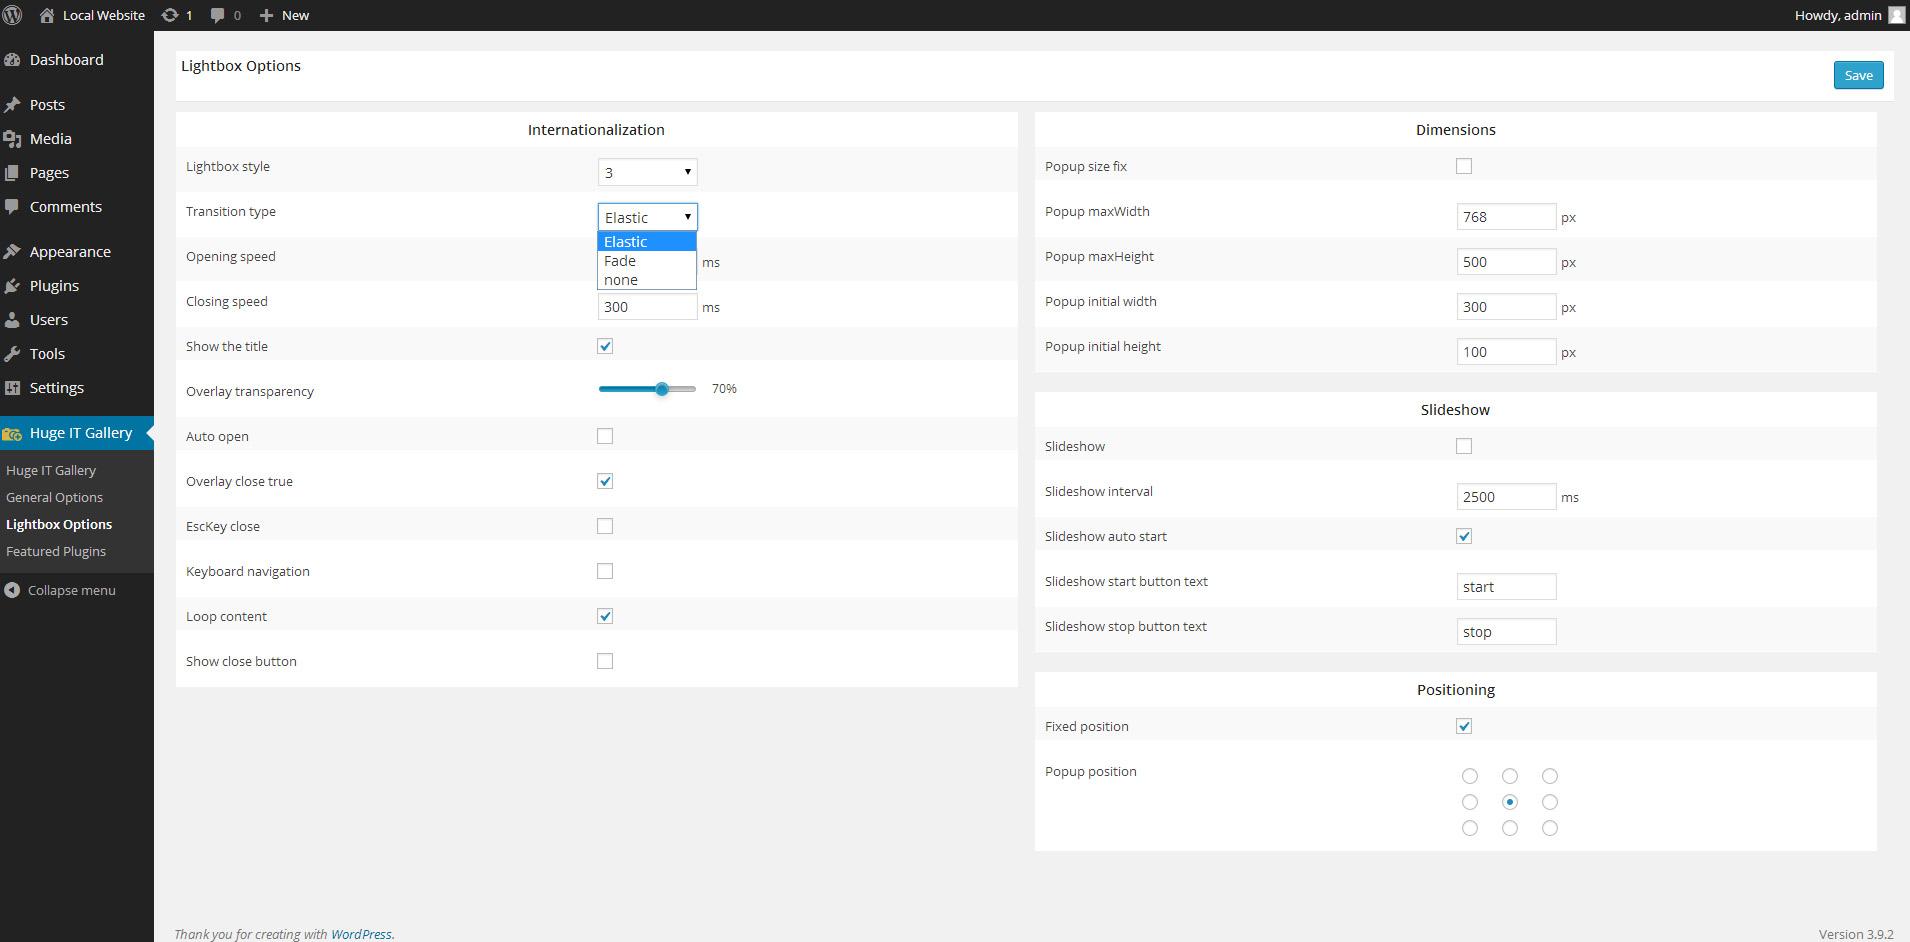 "<a href=""https://wordpress.org/plugins/gallery-images/"">WordPress Image Gallery</a> - Image Gallery Lightbox options"